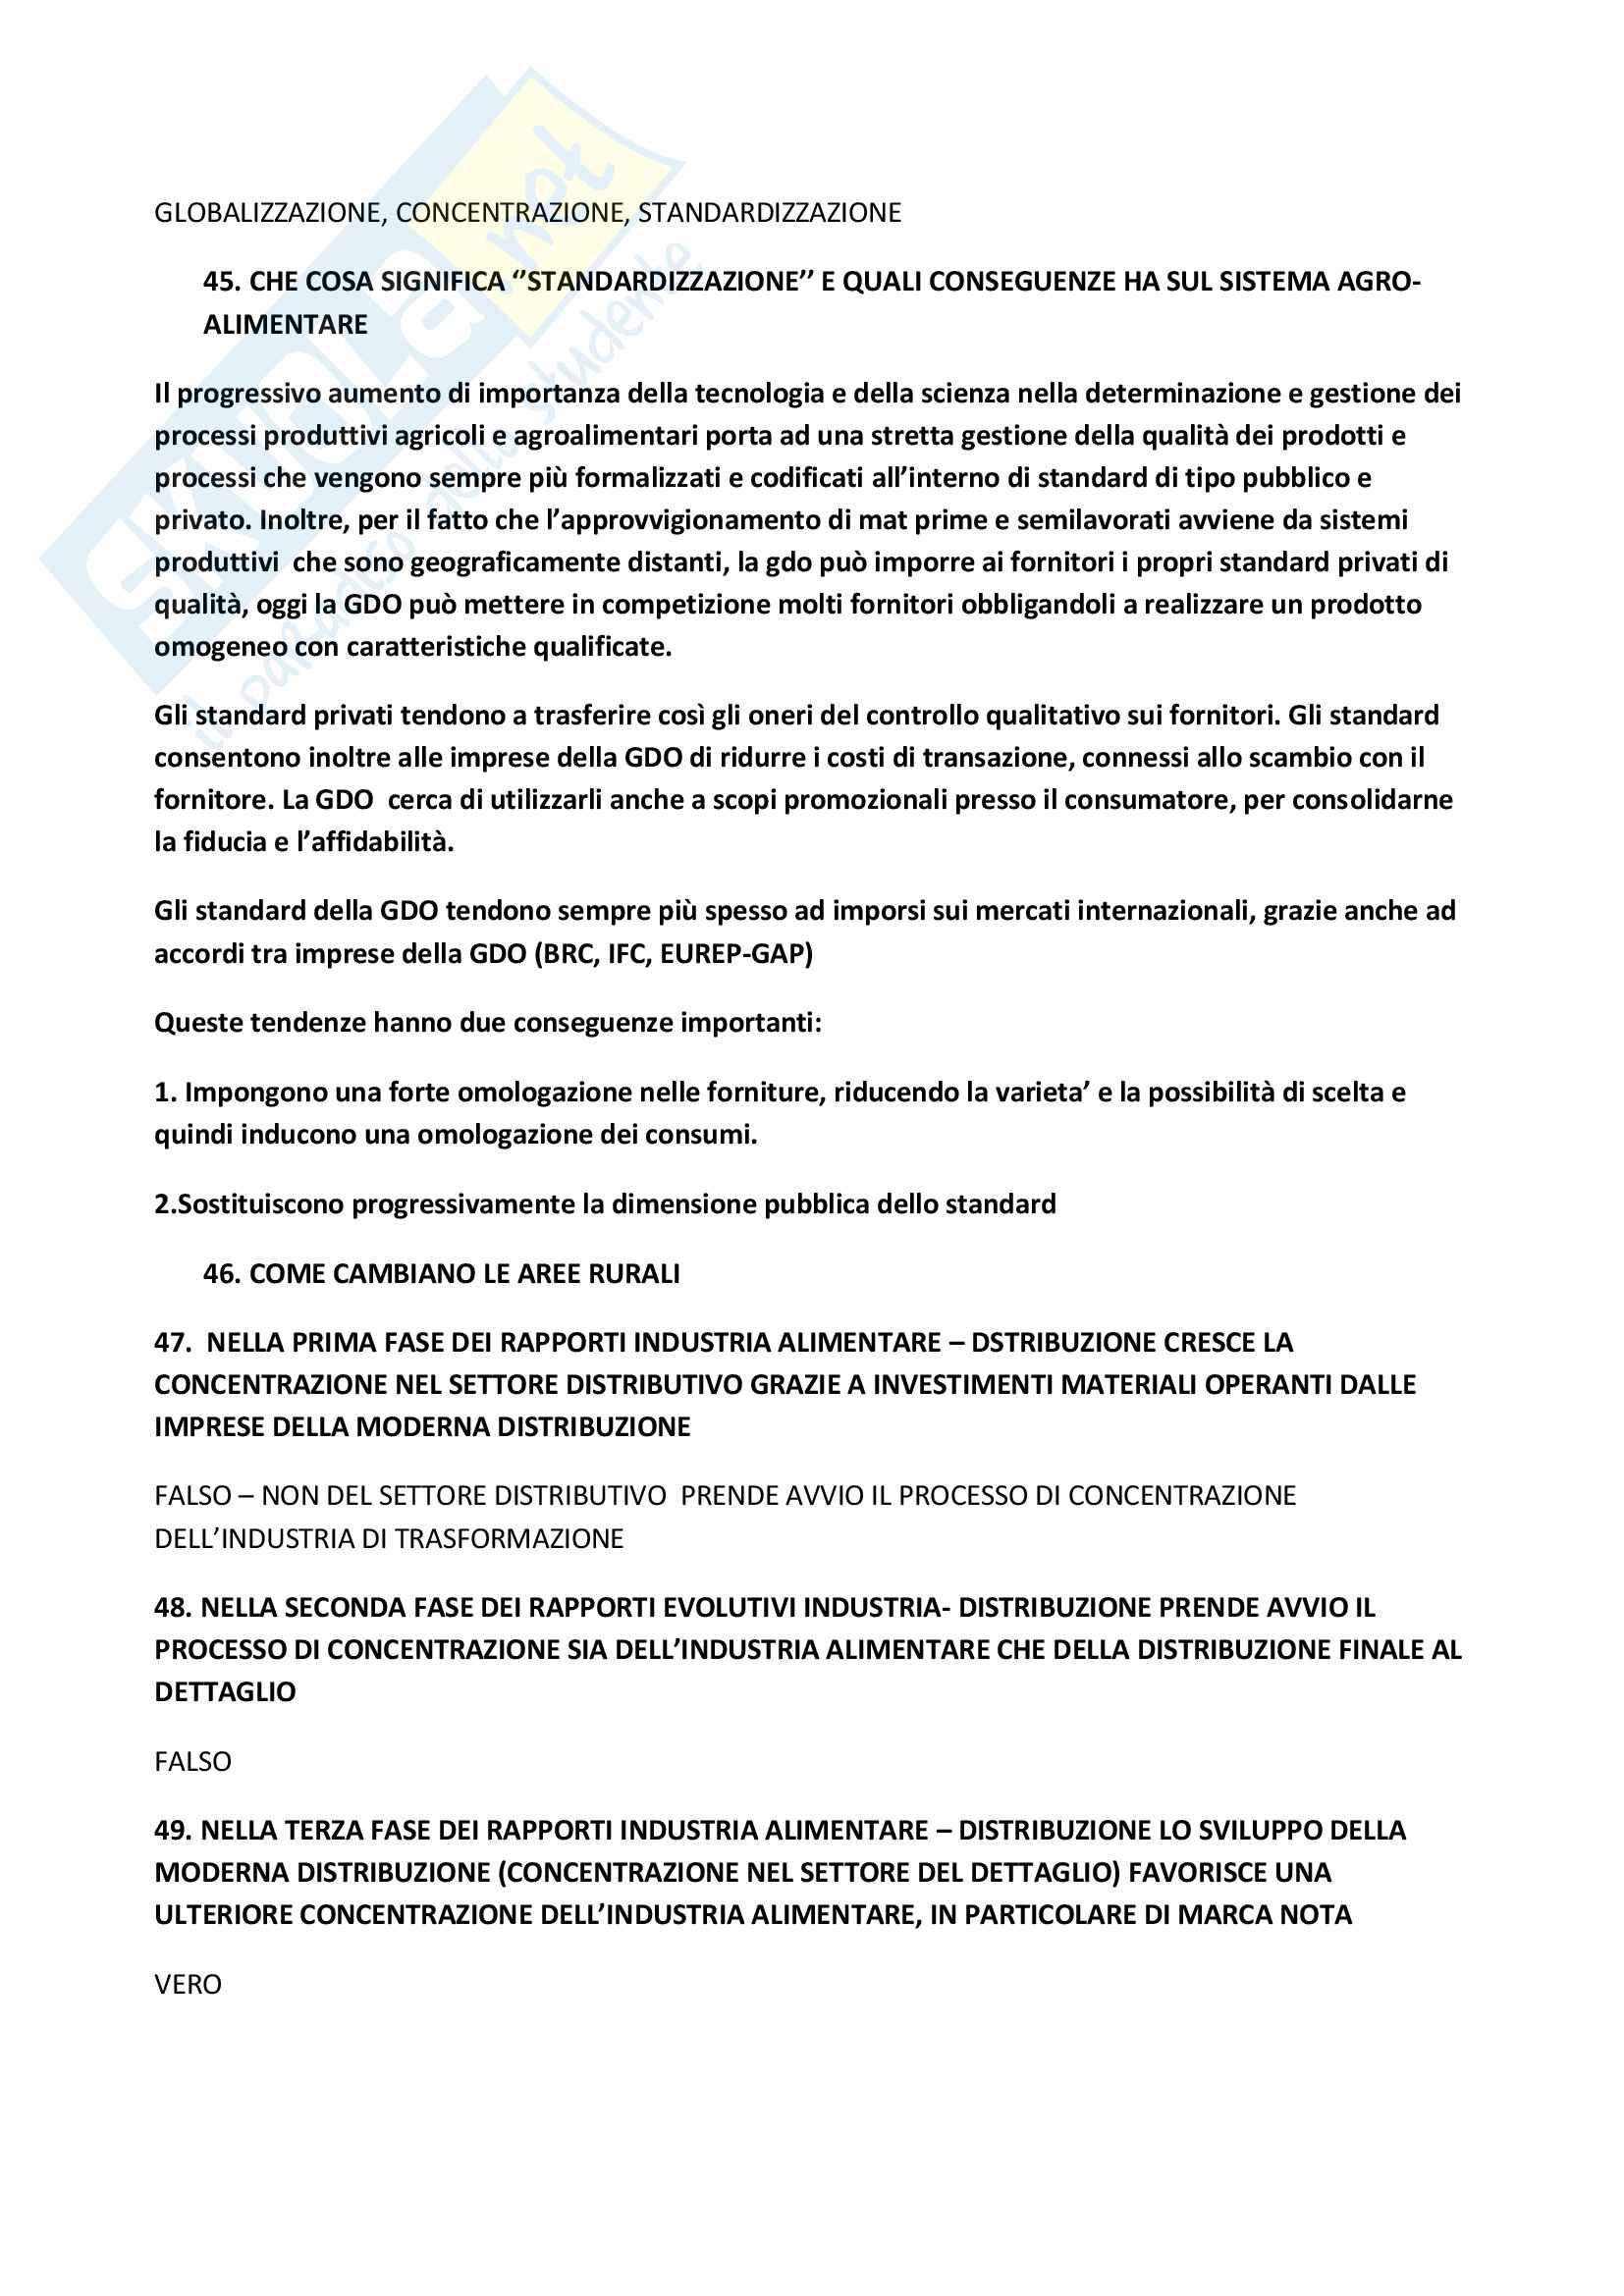 Domande Agroalimentare Pag. 16